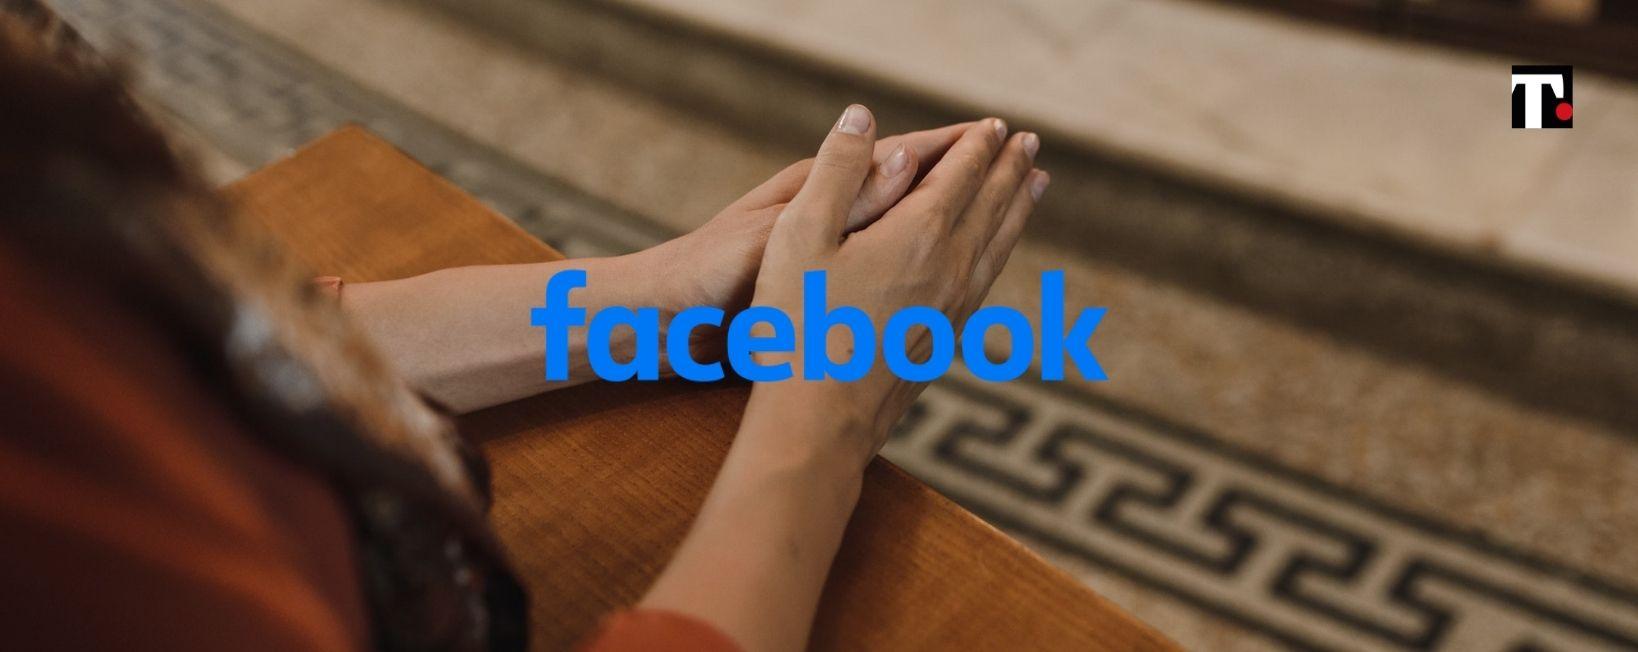 prayer posts facebook